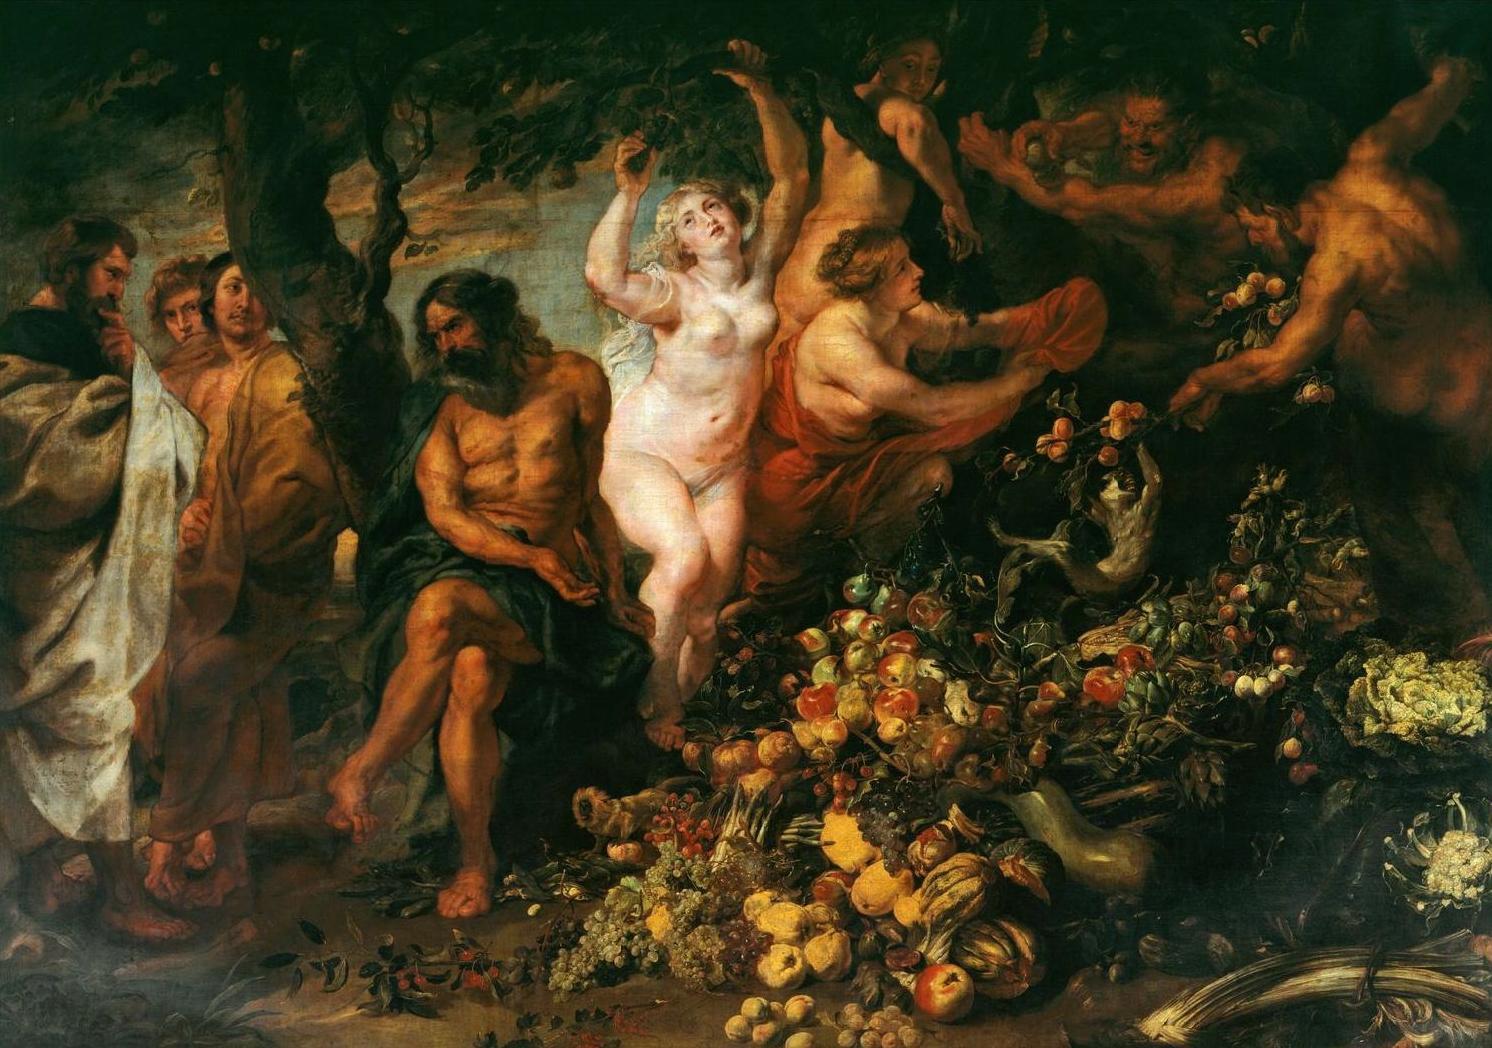 Pythagoras_advocating_vegetarianism_(1618-20);_Peter_Paul_Rubens